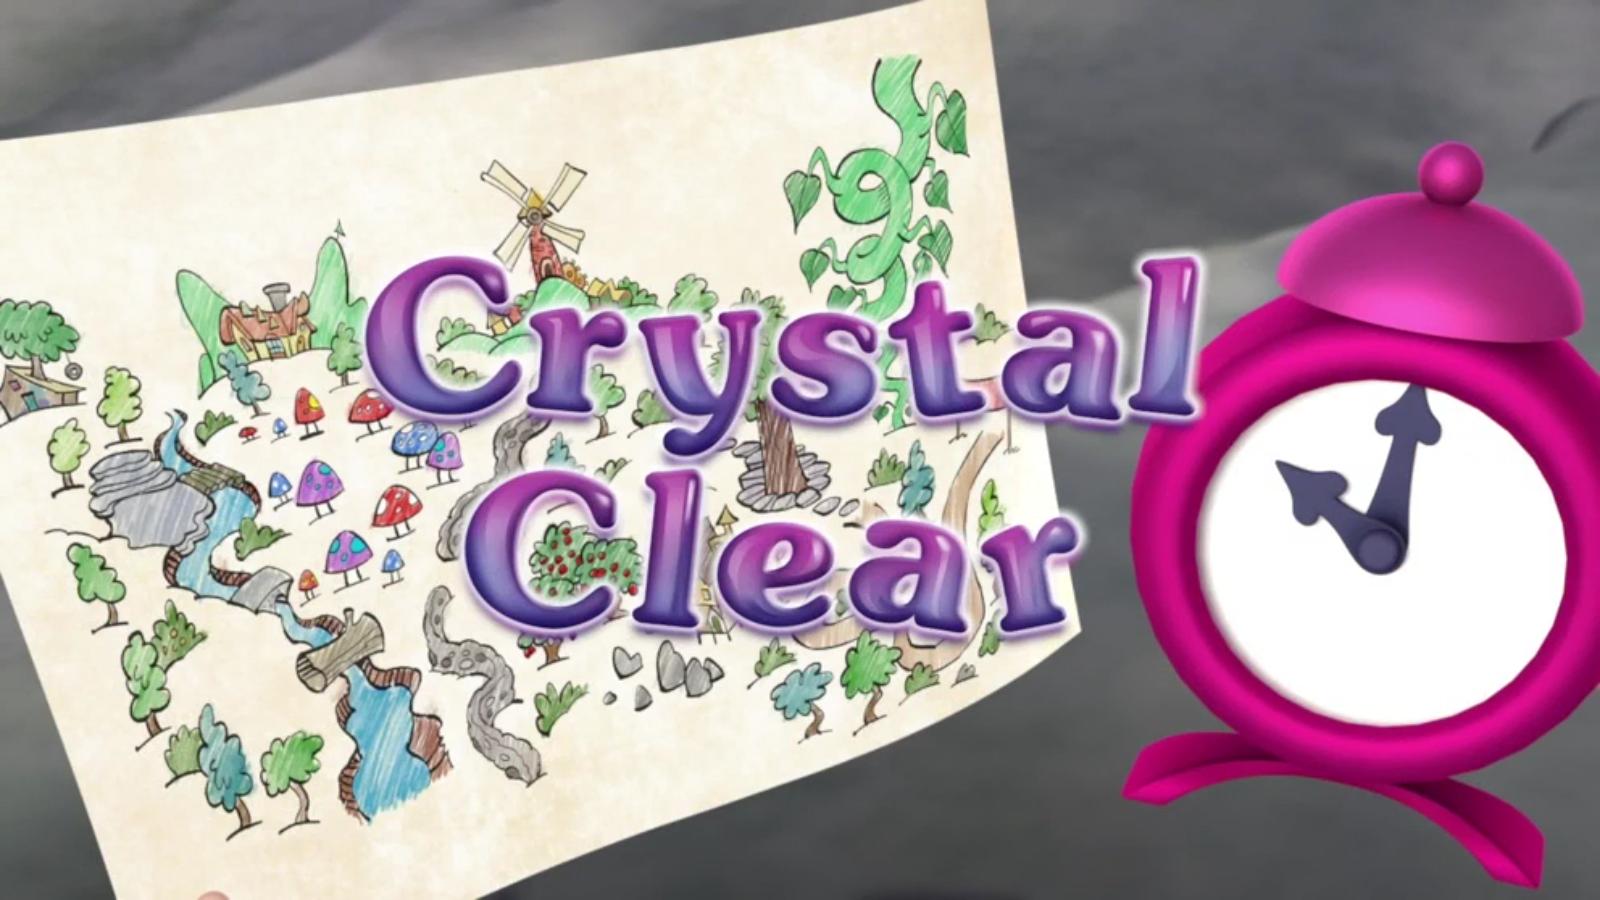 Crystal Clear (Goldie & Bear)